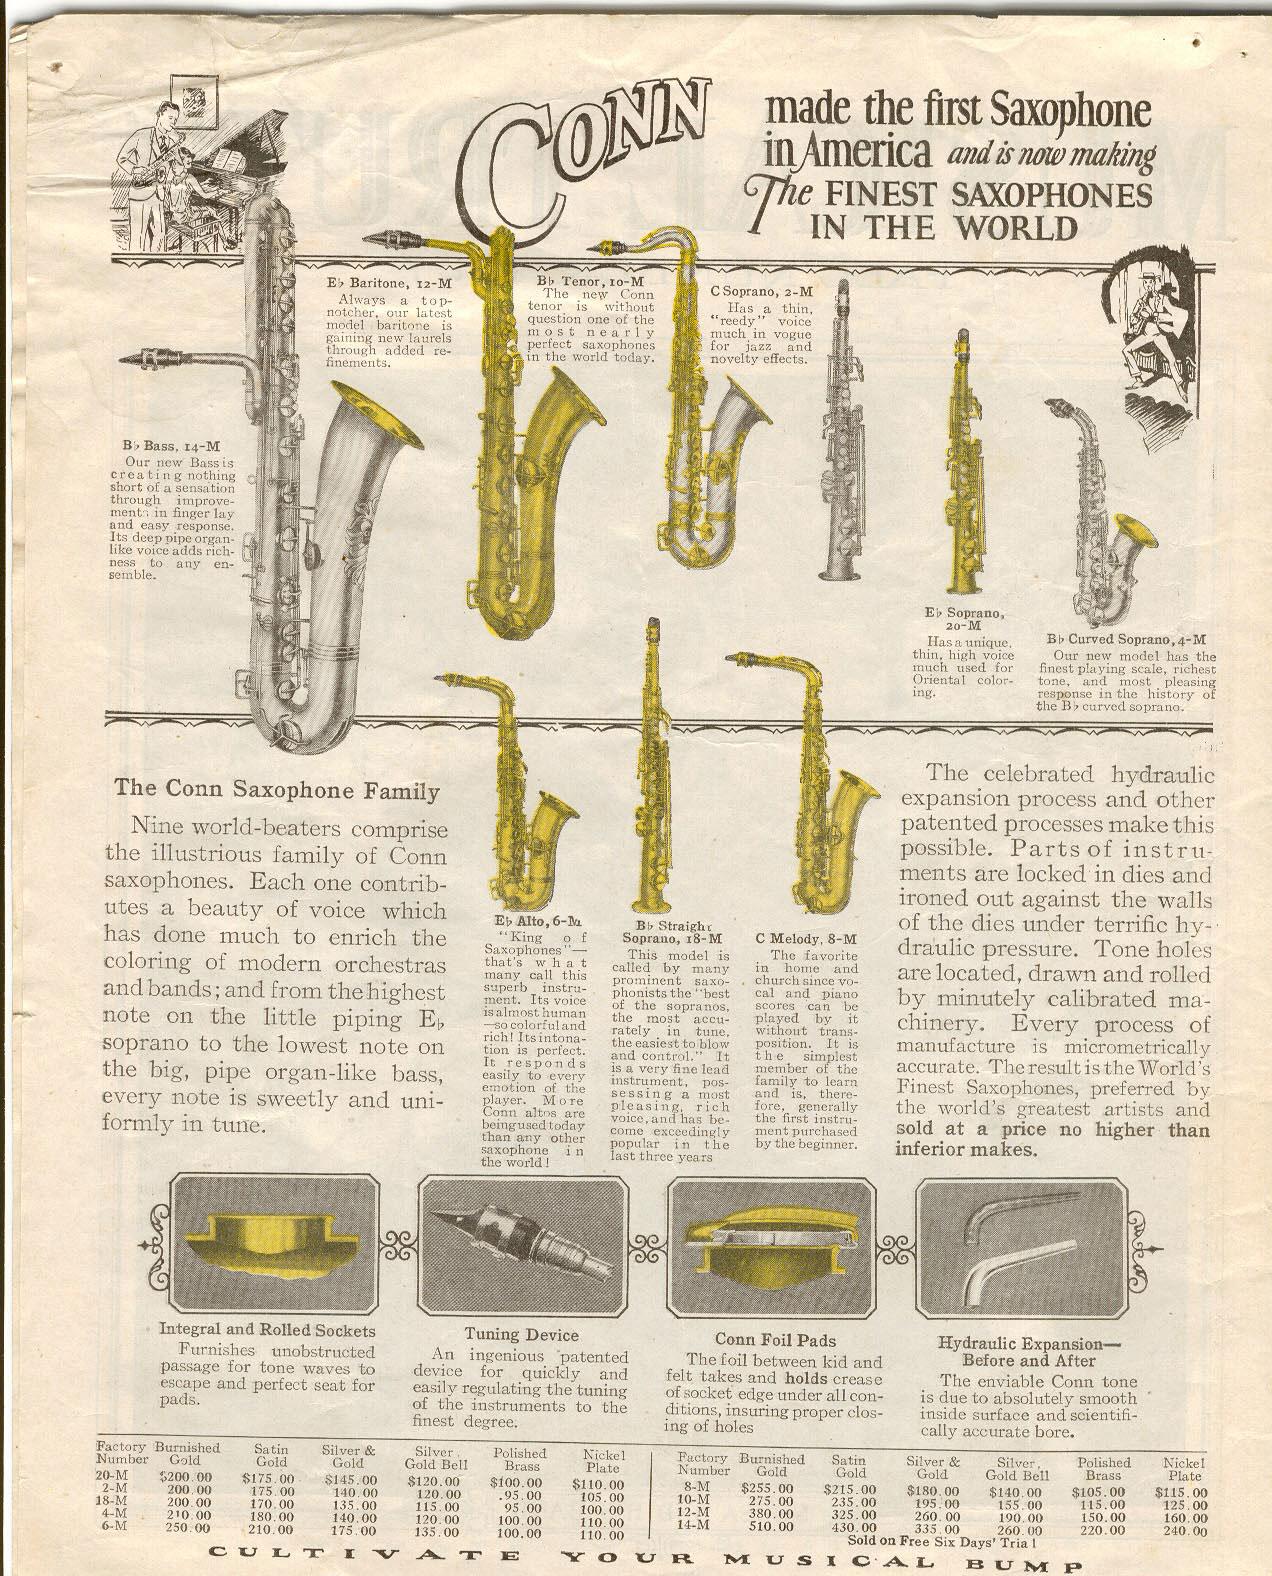 Types of saxophones cordons amp harnais saxophones 1170 183 952